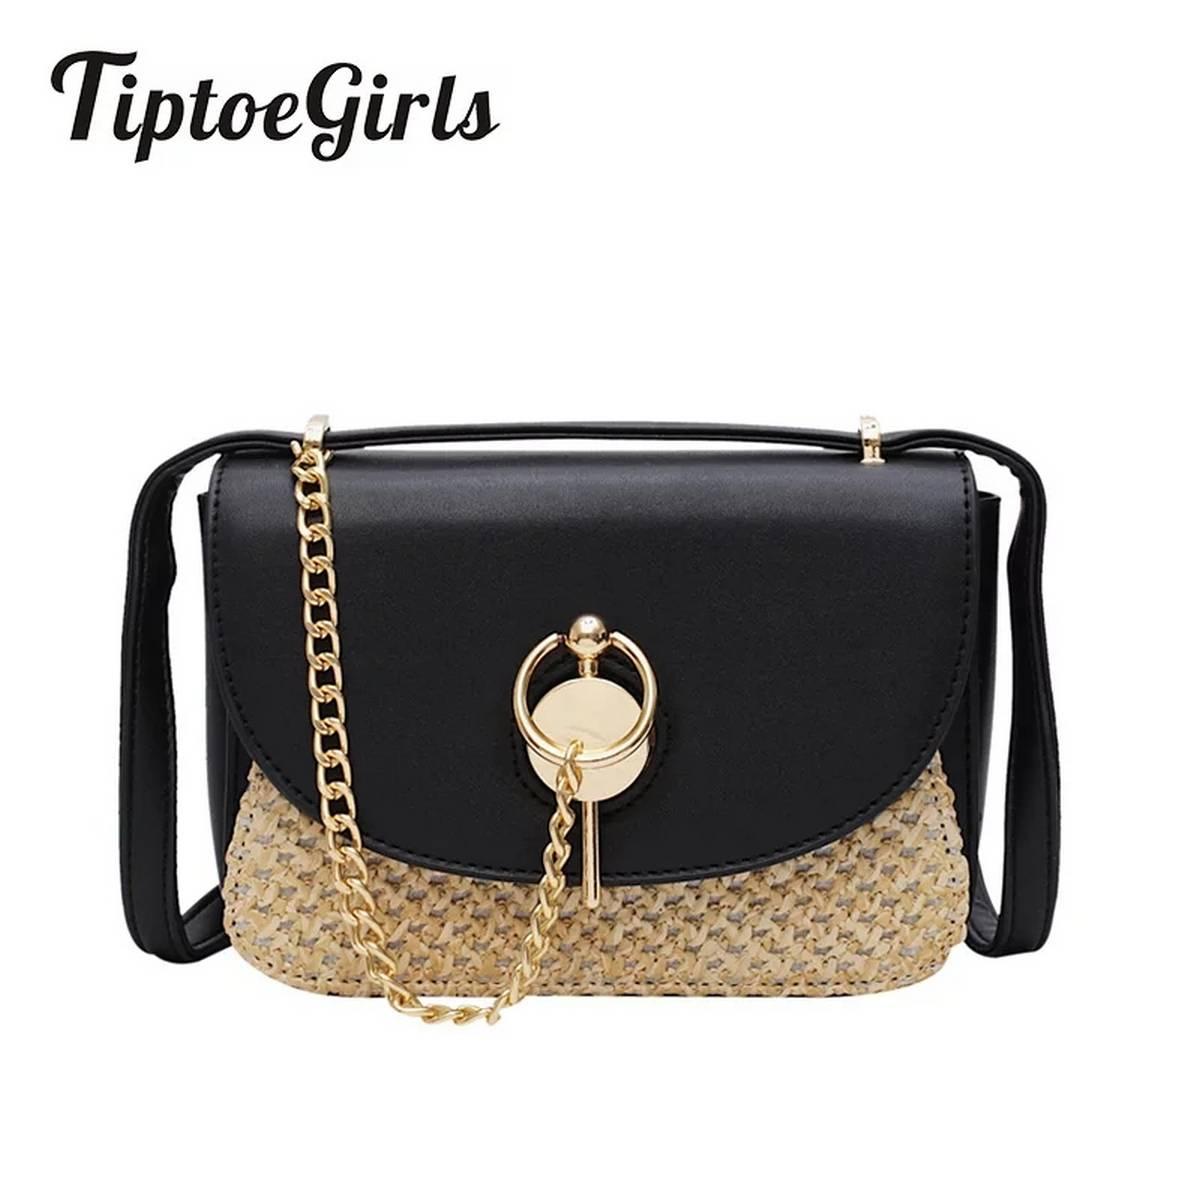 Ladies Wallets Women Hand Wallets Ladies Clutches Handbags Women Clutch Wallet Sidebag Shoulder Bags Mobile Wallets